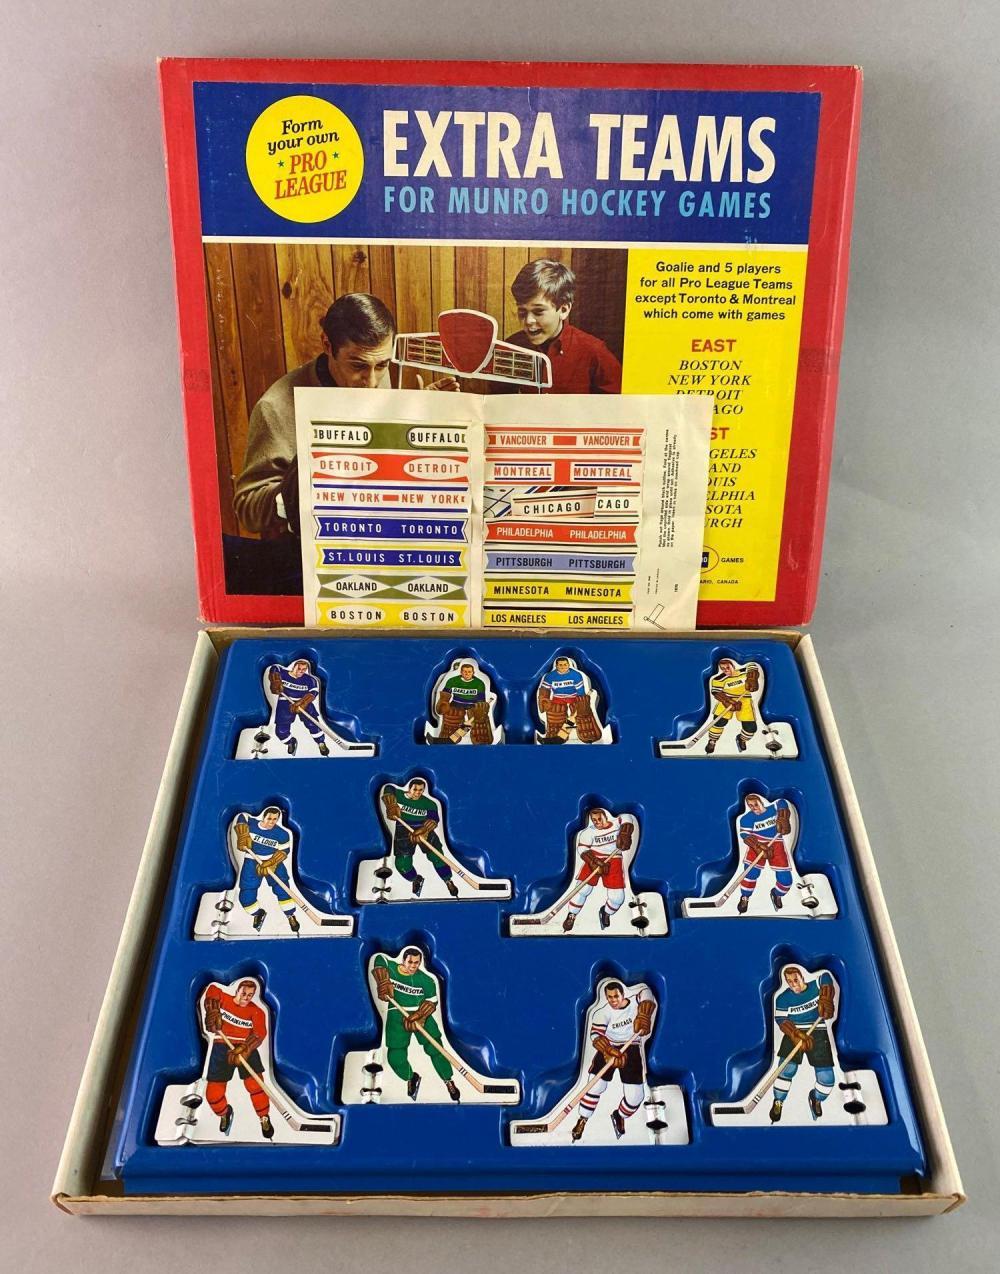 Munro Hockey Games Extra Teams